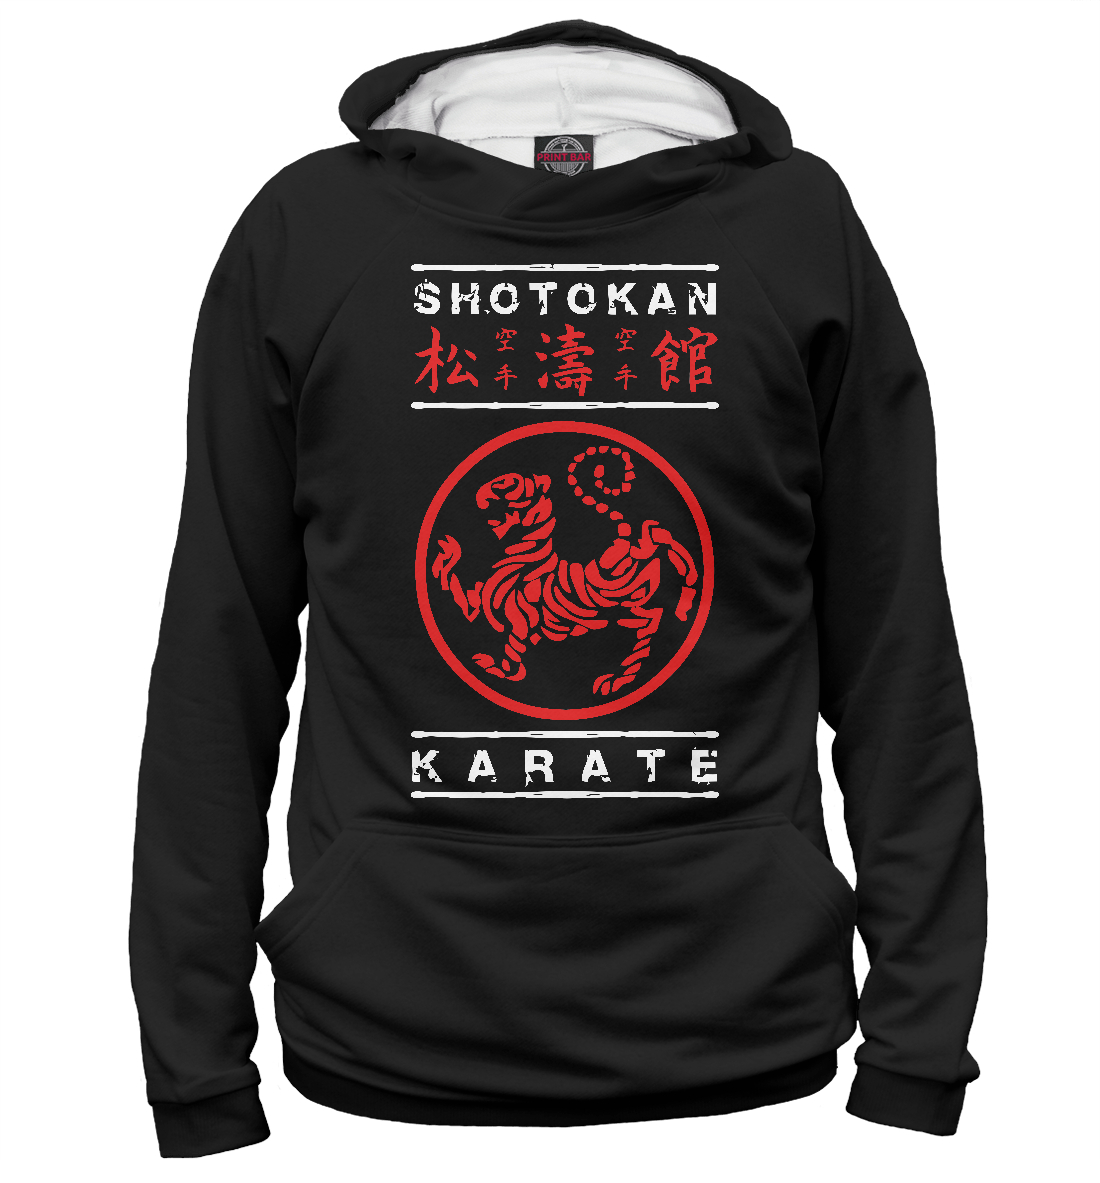 Shotokan Karate недорого